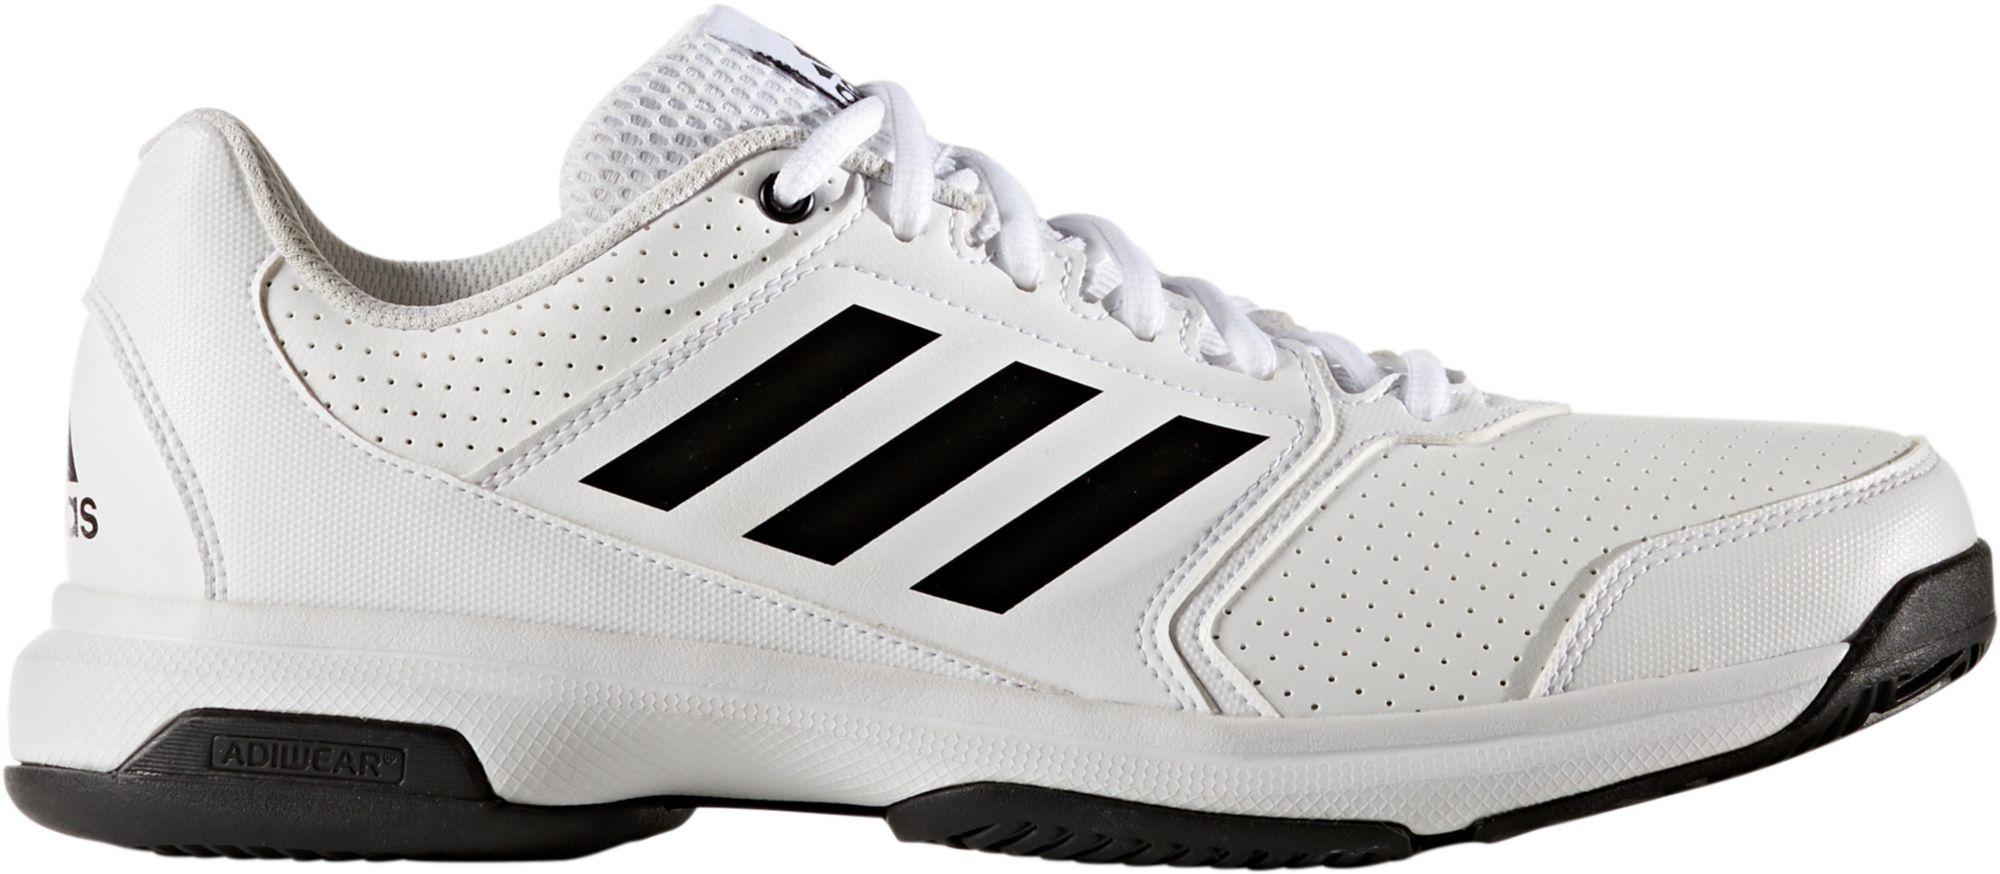 Product Image Adidas Men S Adizero Tennis Shoes